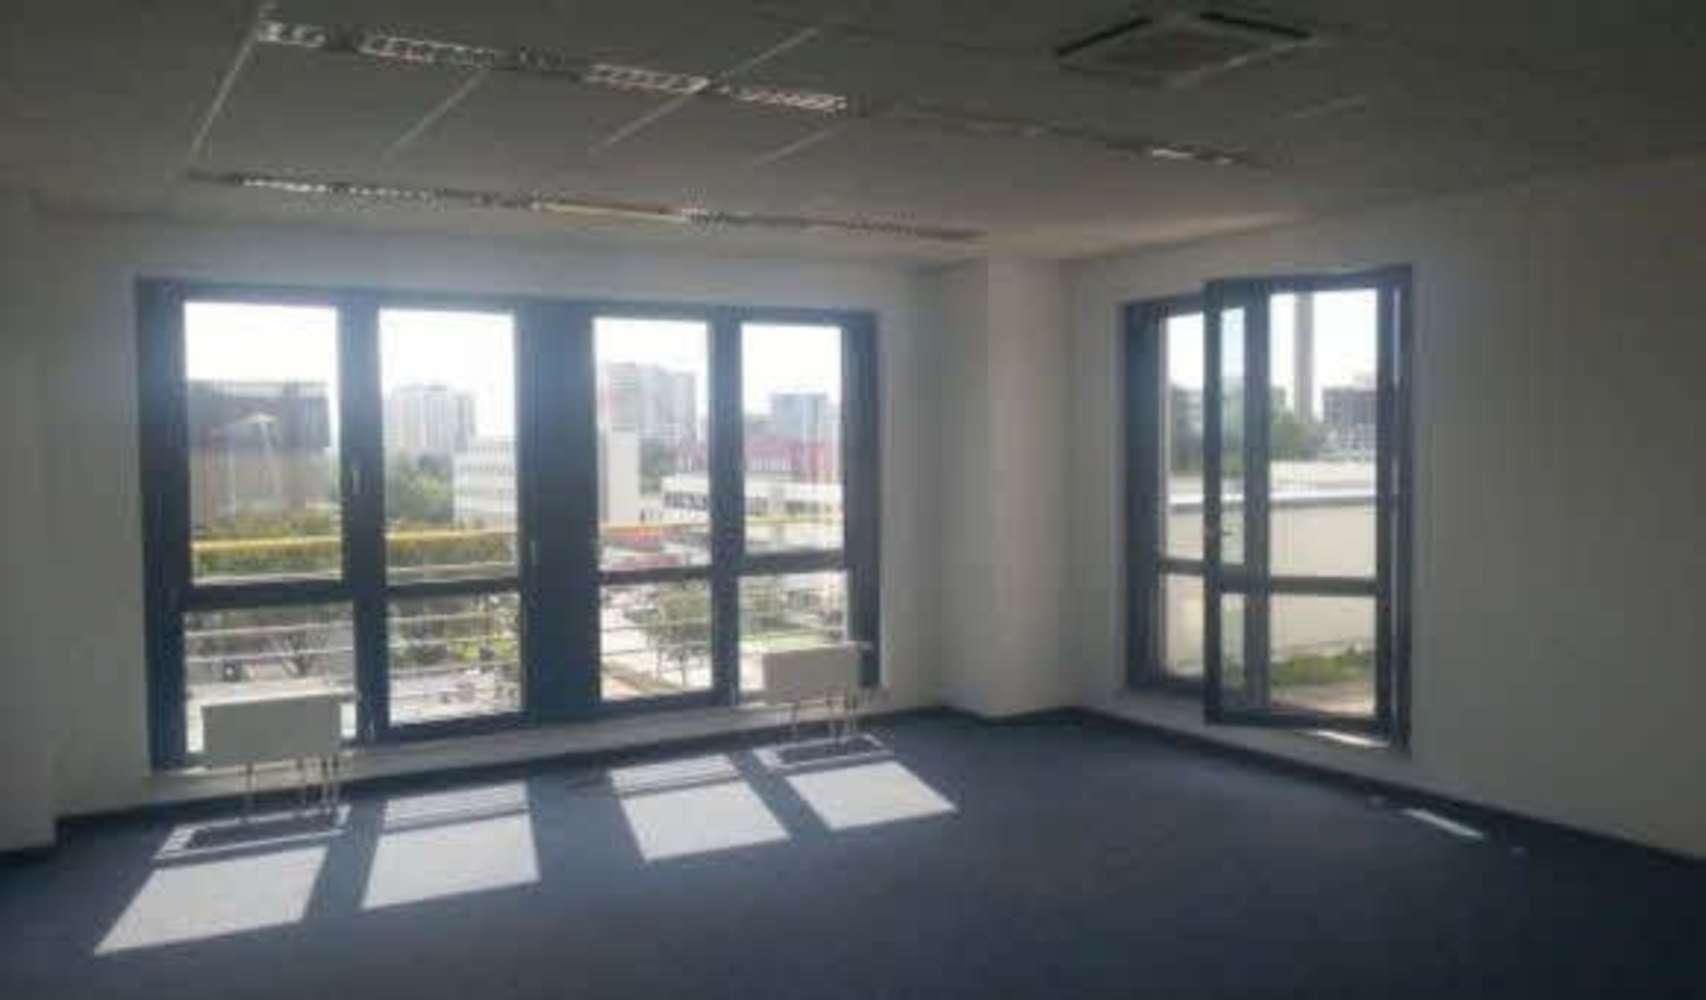 Büros Frankfurt am main, 60437 - Büro - Frankfurt am Main, Nieder-Eschbach - F1918 - 9414556